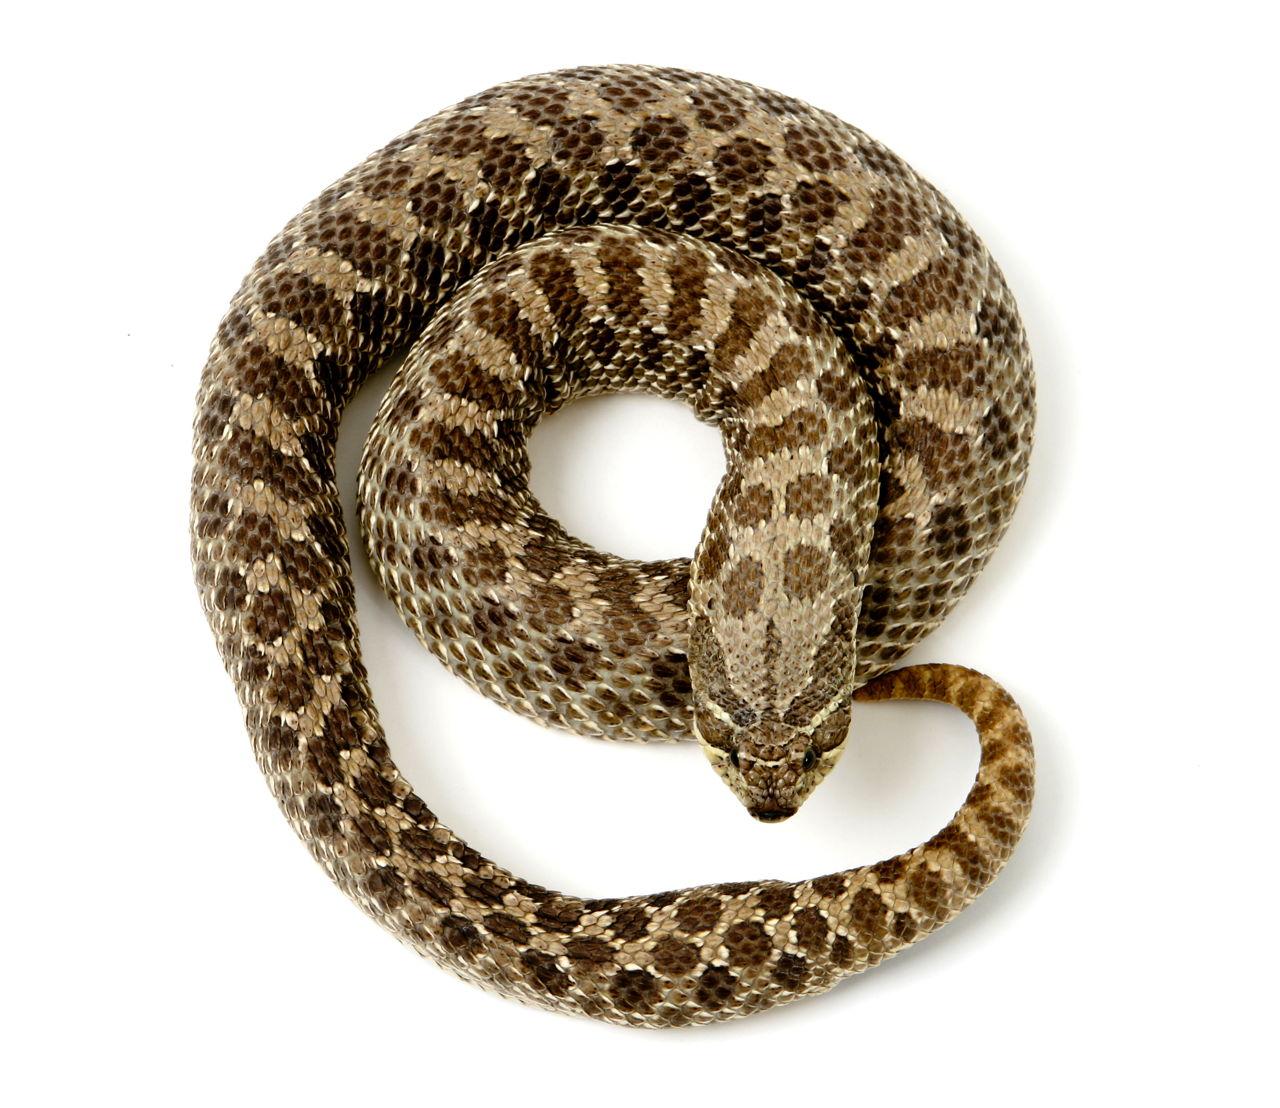 worksheet Life Cycle Of A Snake Worksheet 3 stages in the life cycle of a snake coiled hognose snake